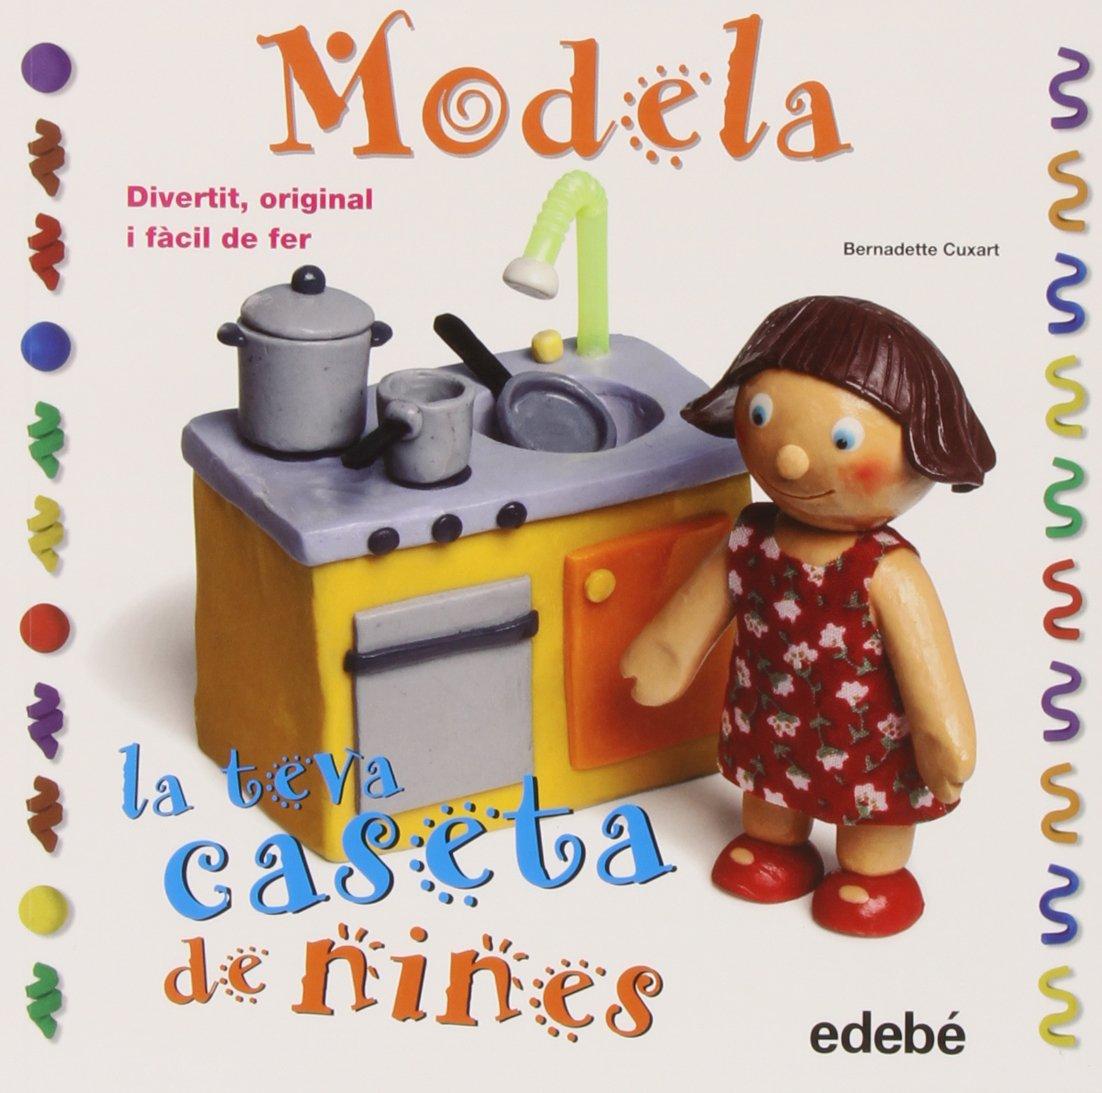 Modela la teva caseta de nines: Amazon.es: Bernadette Cuxart Picart: Libros